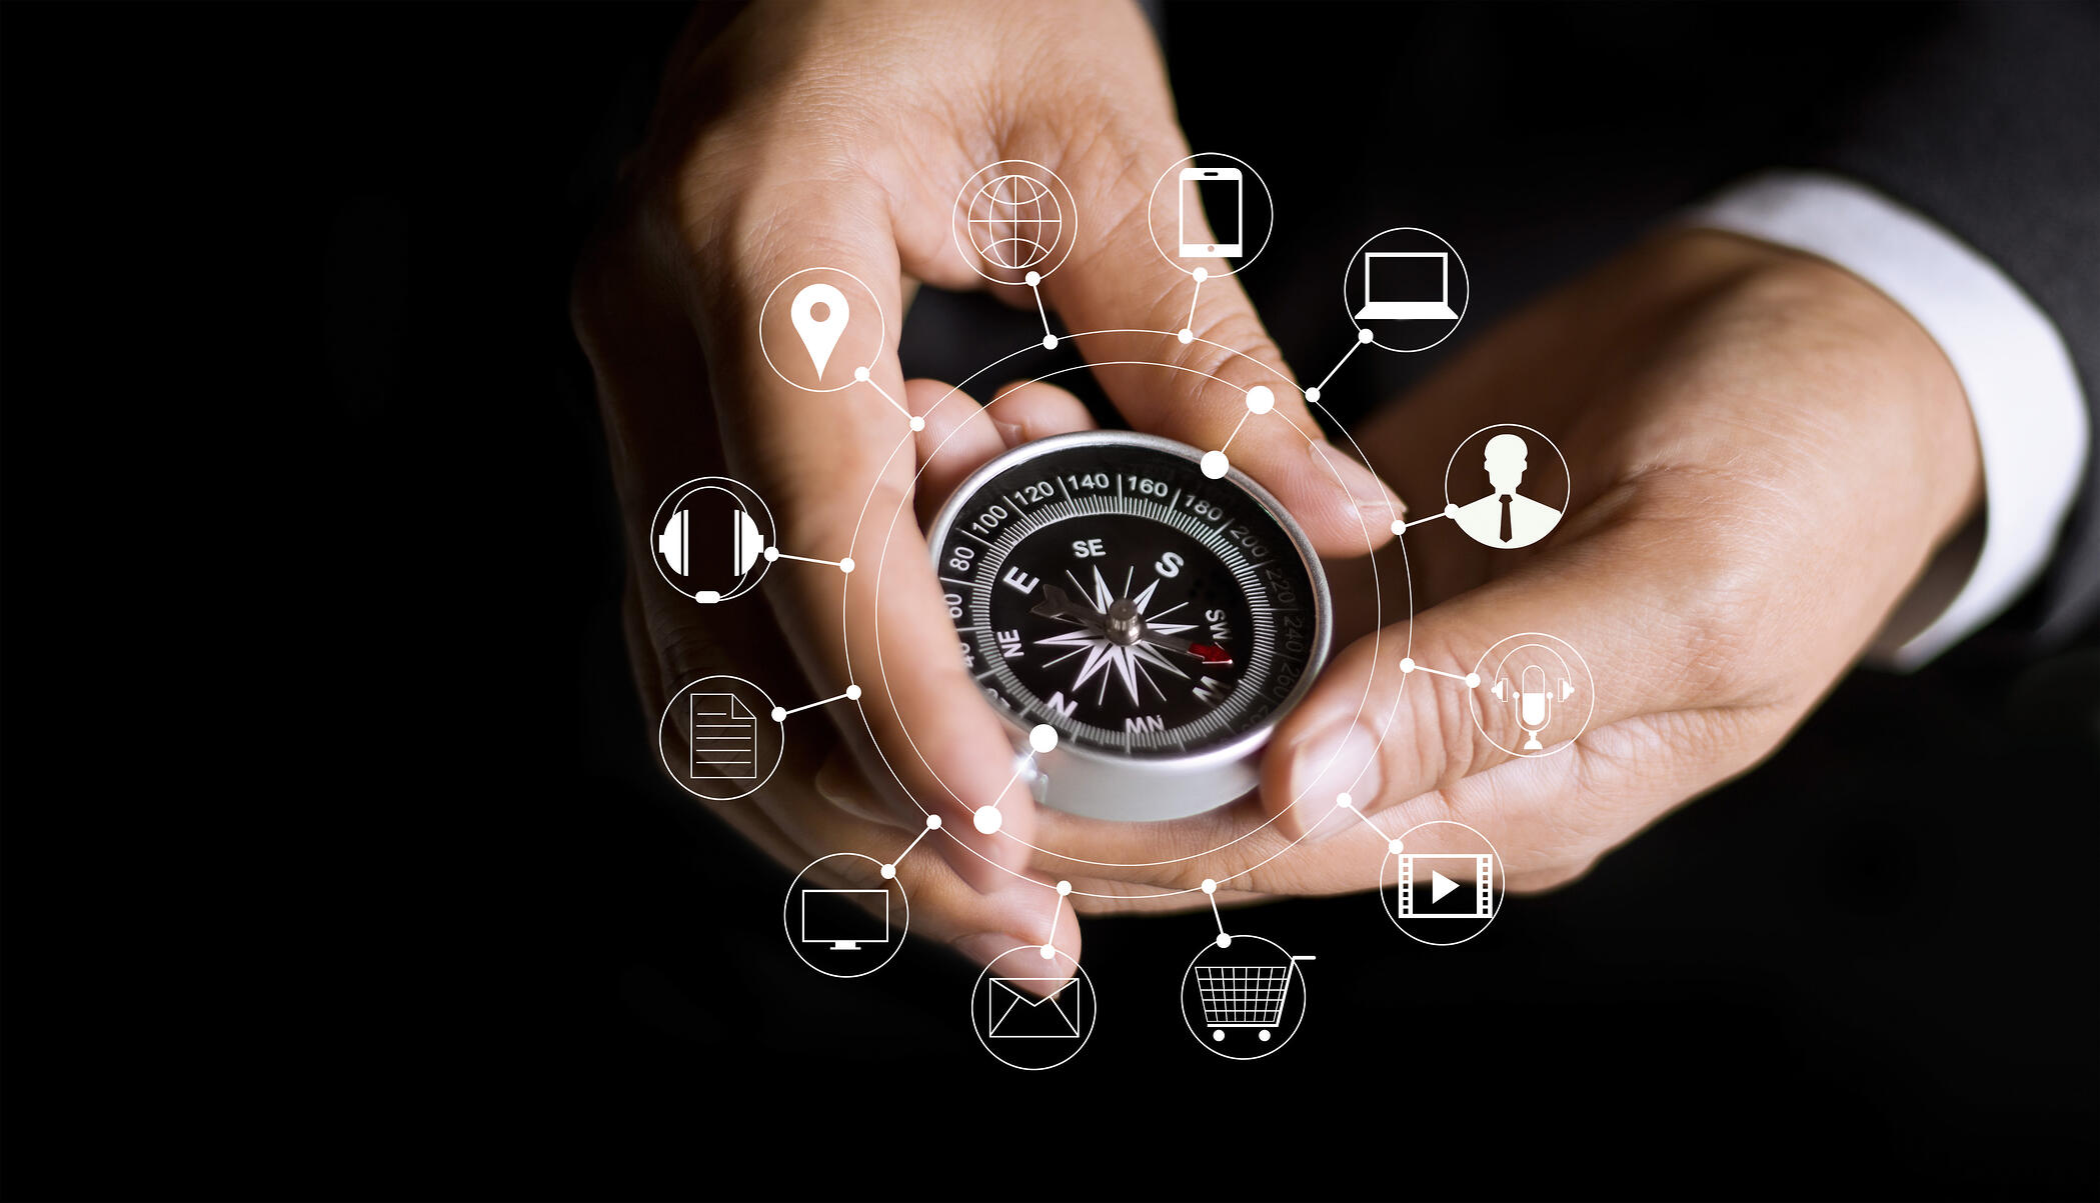 Soluzioni_inbound_marketing_magellano